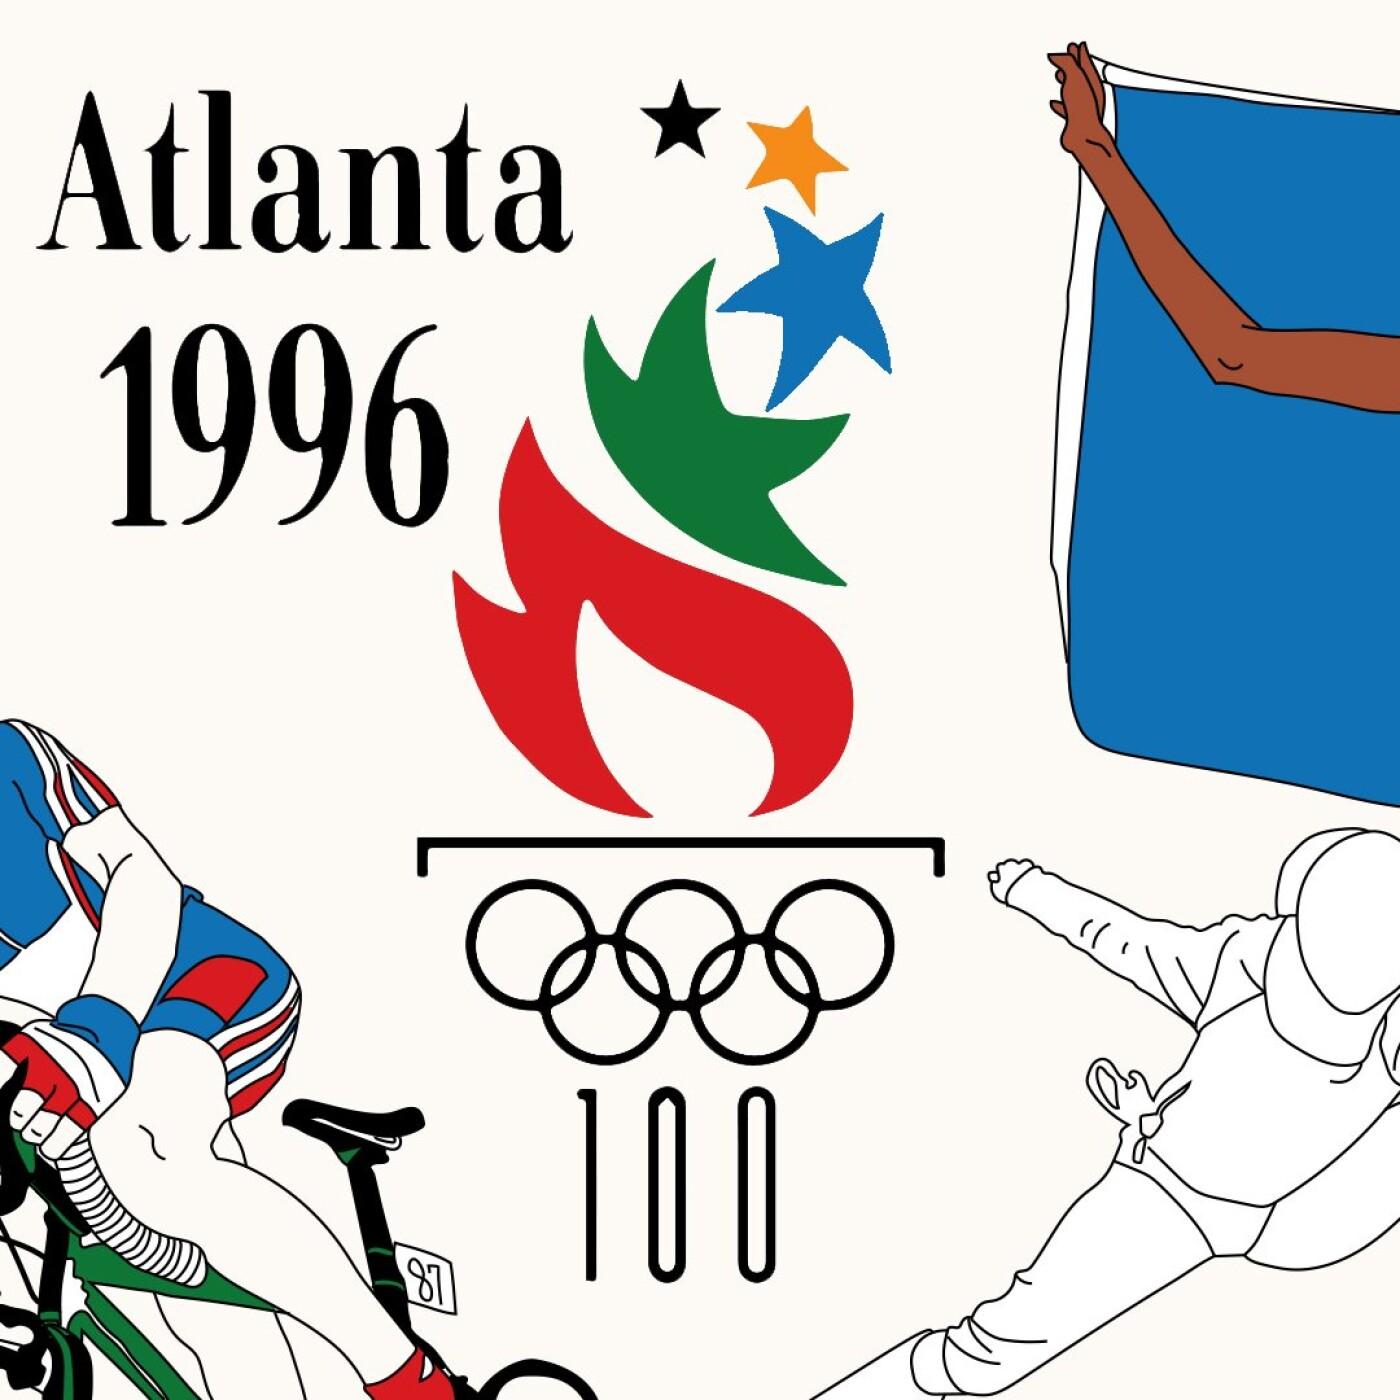 Jeux Olympiques 1996 - Atlanta